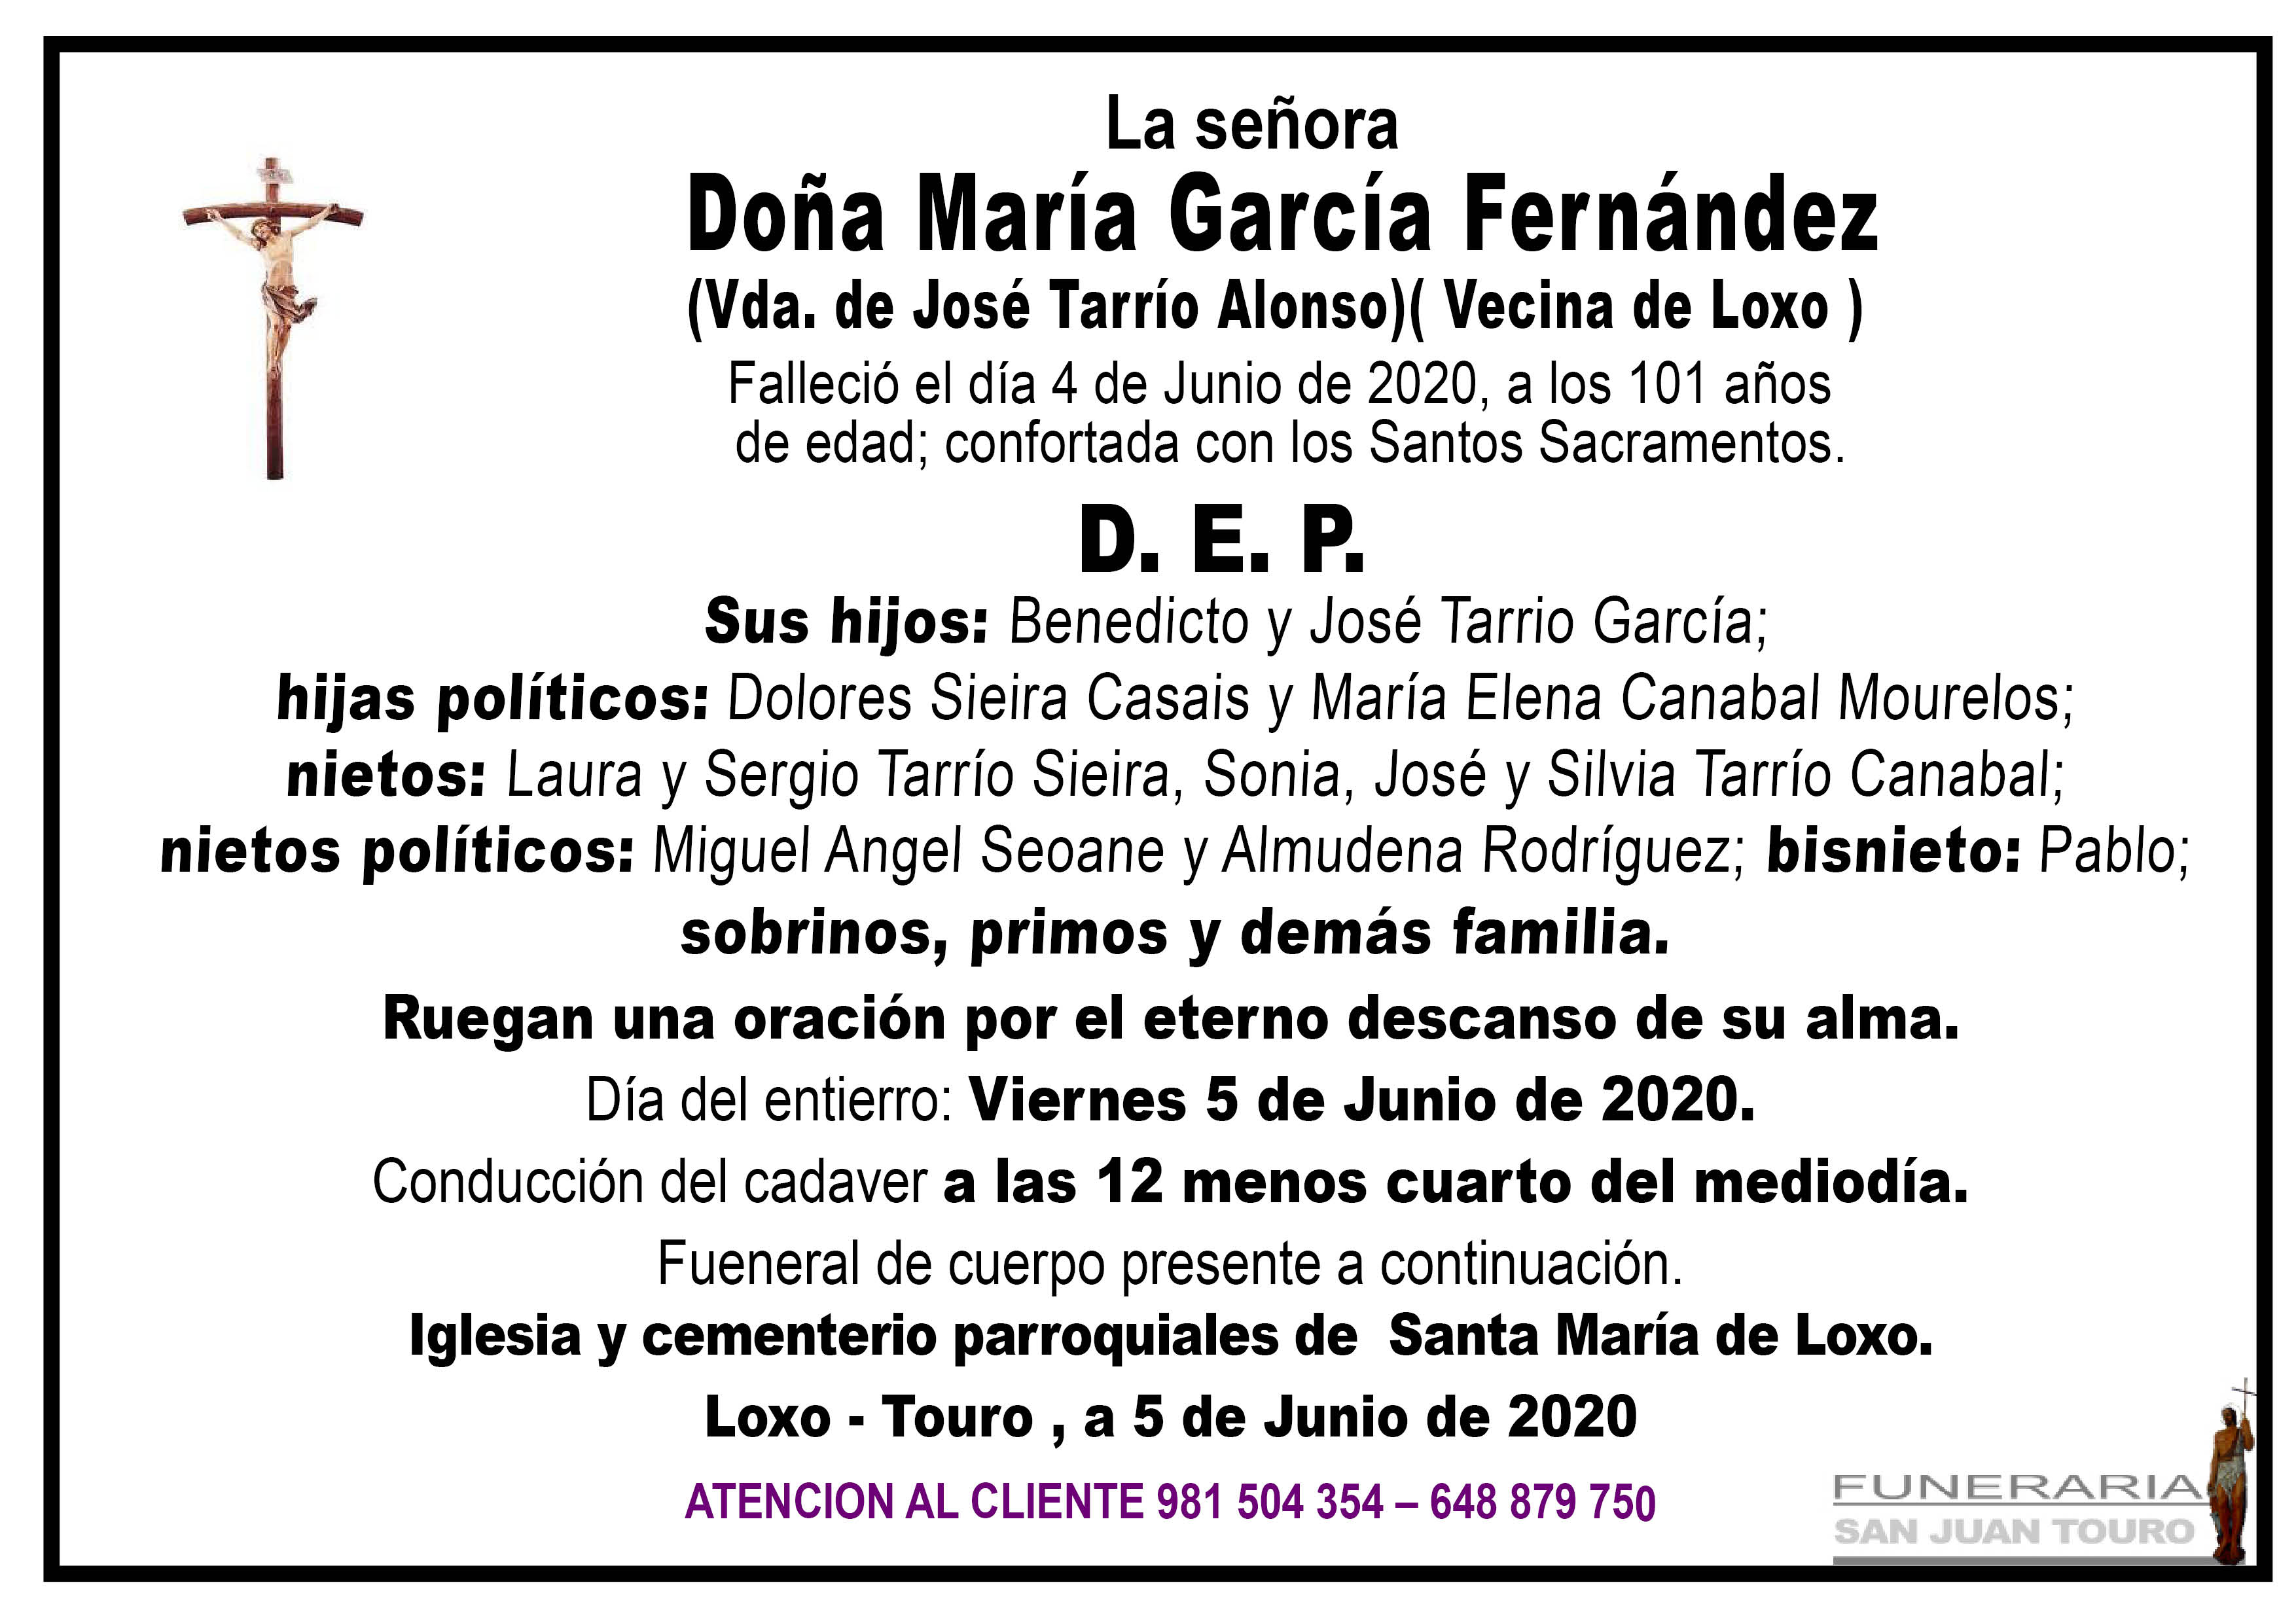 Esquela de SEPELIO DE DOÑA MARÍA GARCÍA FERNÁNDEZ